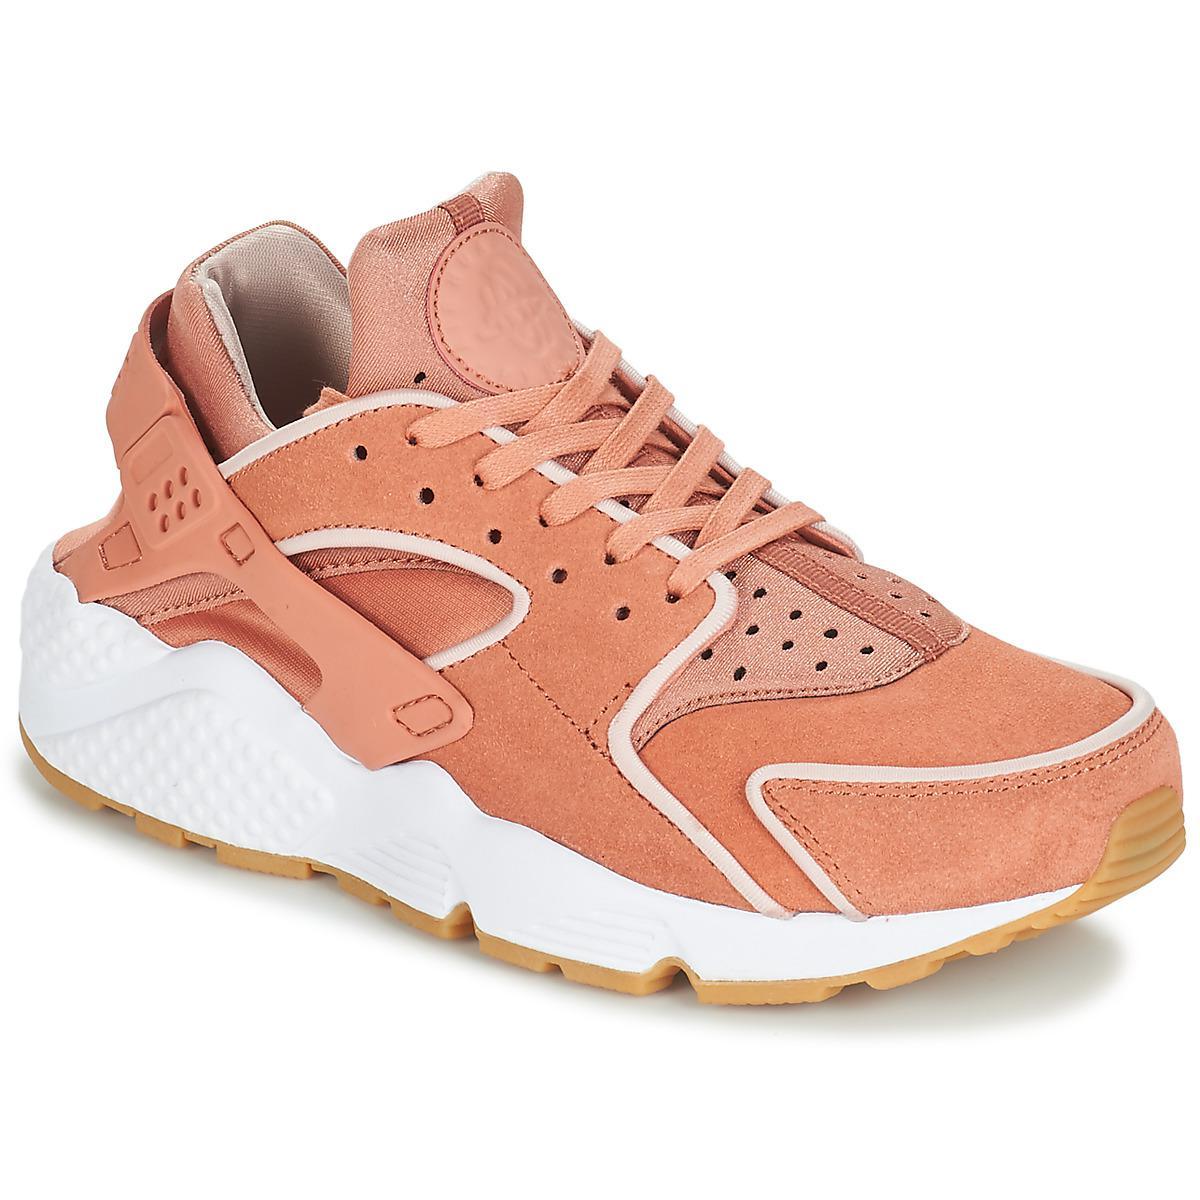 d794b758d809 Nike Air Huarache Run Premium W Women s Shoes (trainers) In Pink in ...